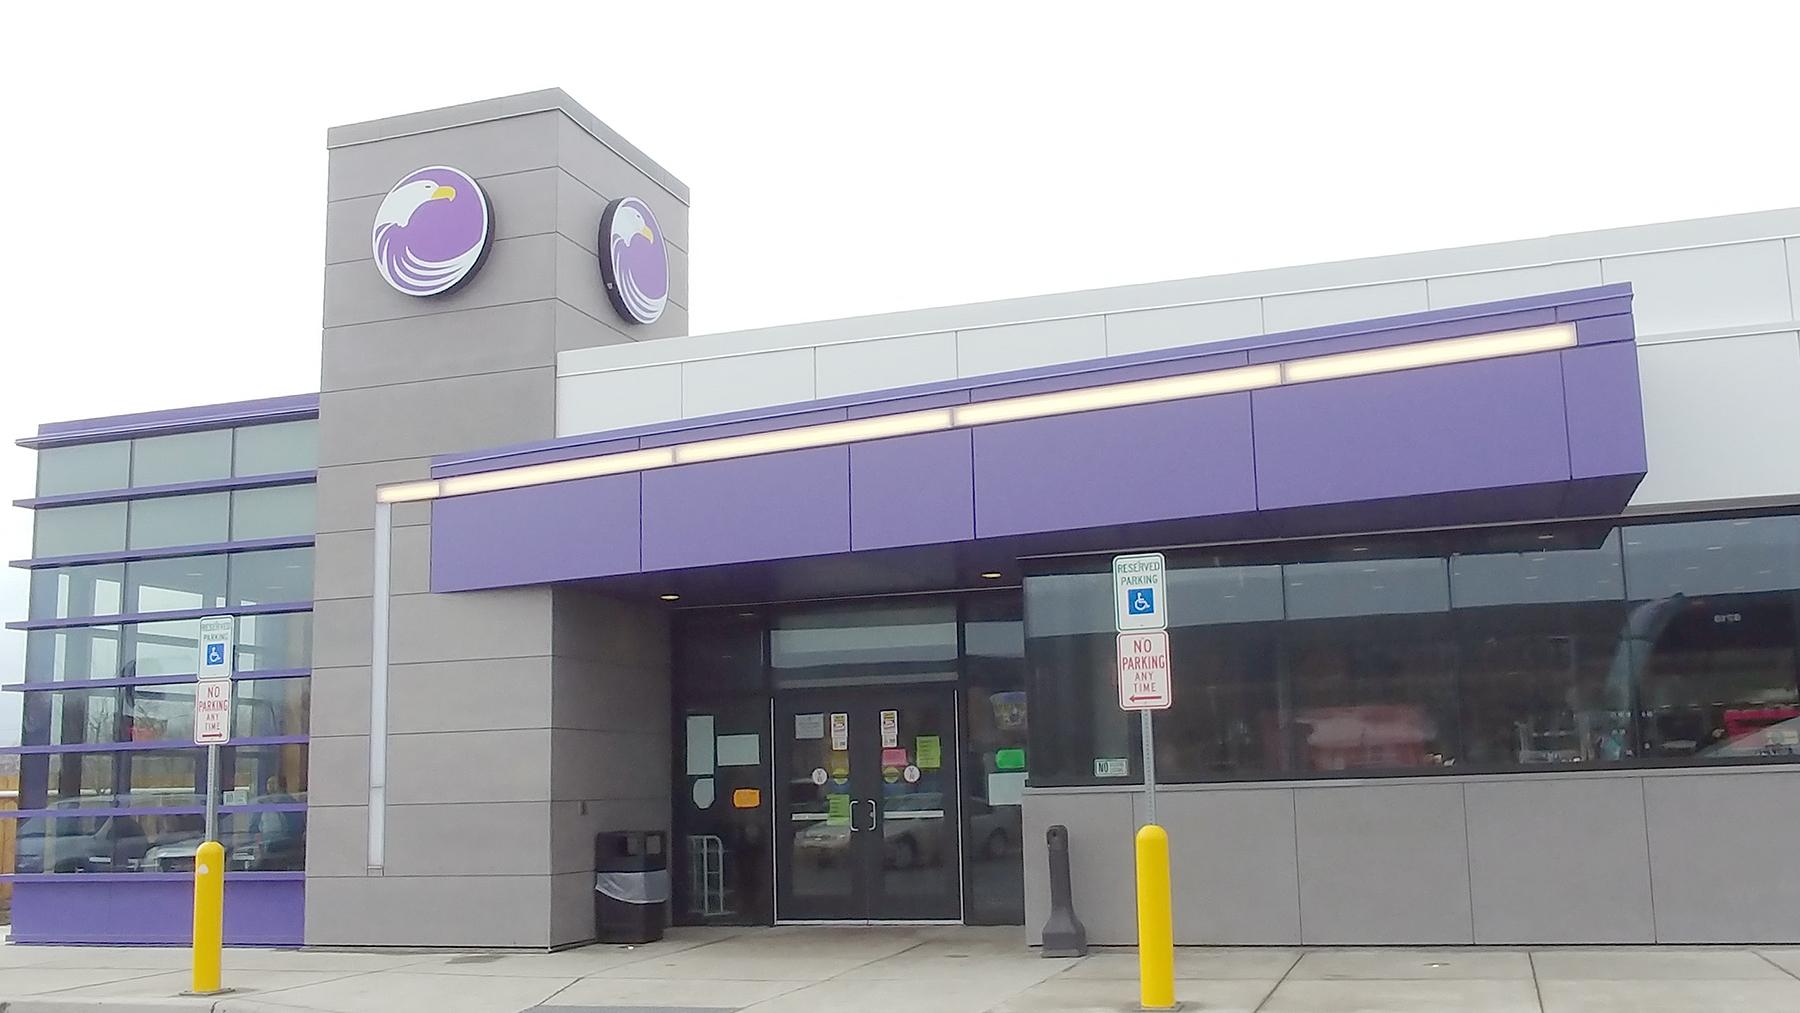 http://abp-distributors.com/wp-content/uploads/2018/04/Seneca-Gas-Station-2.jpg